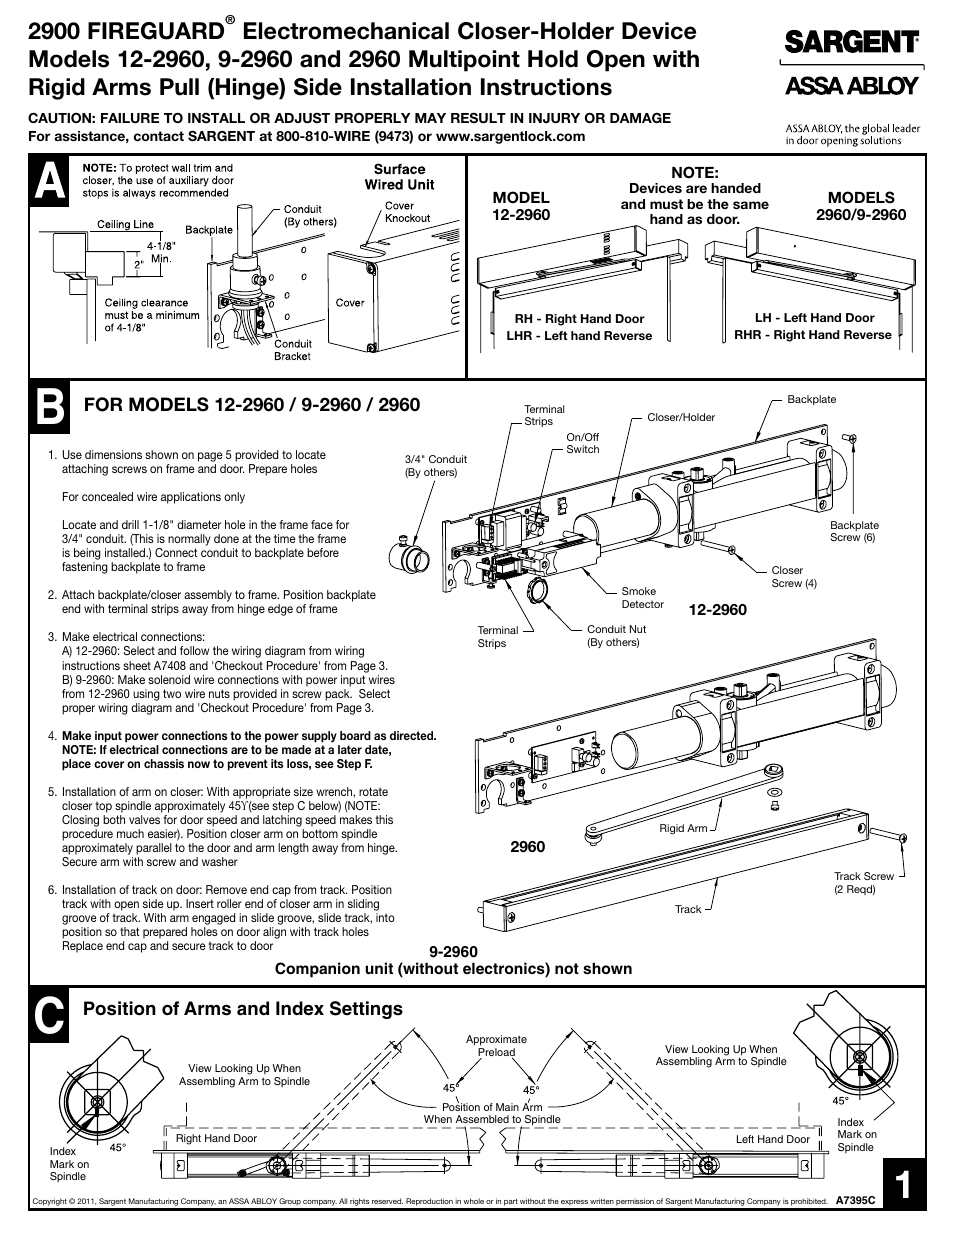 sargent 2900 fire guard electromechanical closer holder user manual rh manualsdir com sargent as210 wiring diagram sargent ec450 wiring diagram